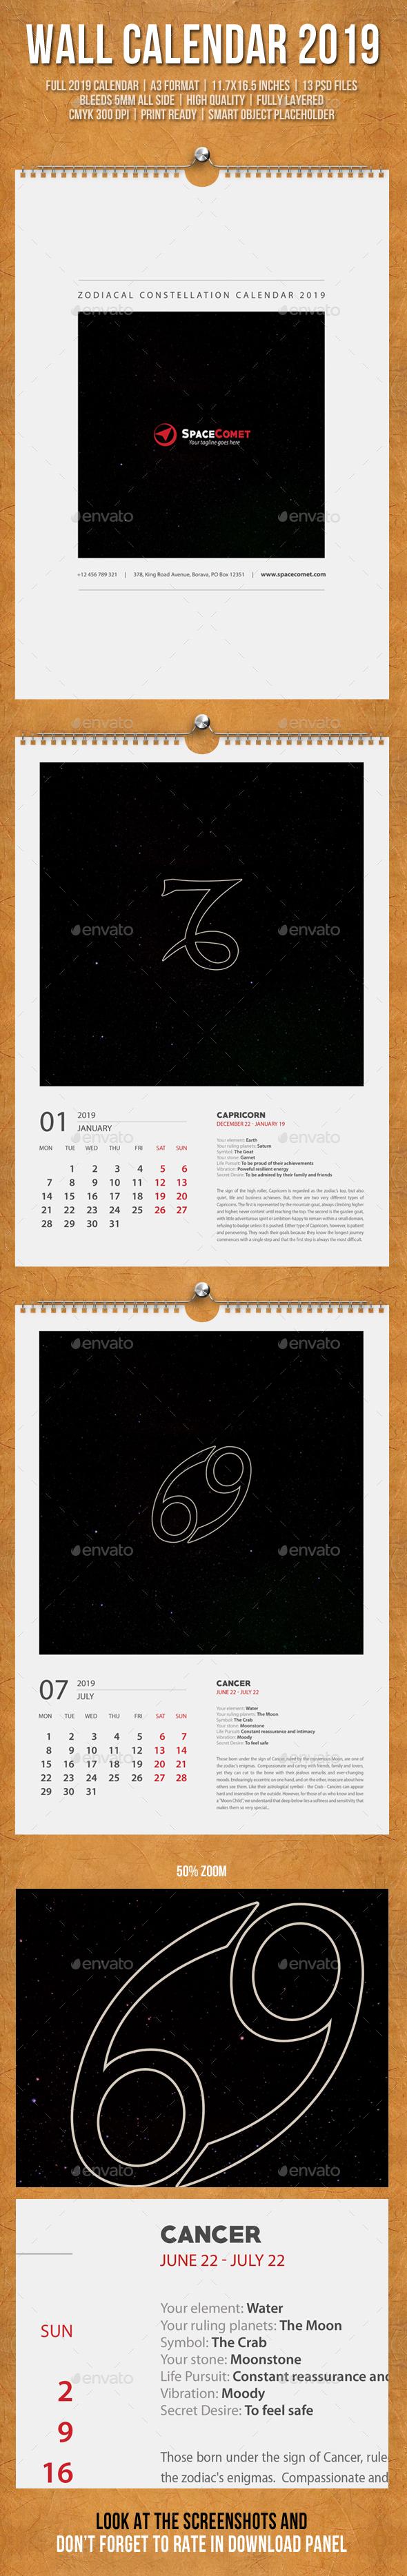 Constellation Wall Calendar A3 2019 - Calendars Stationery